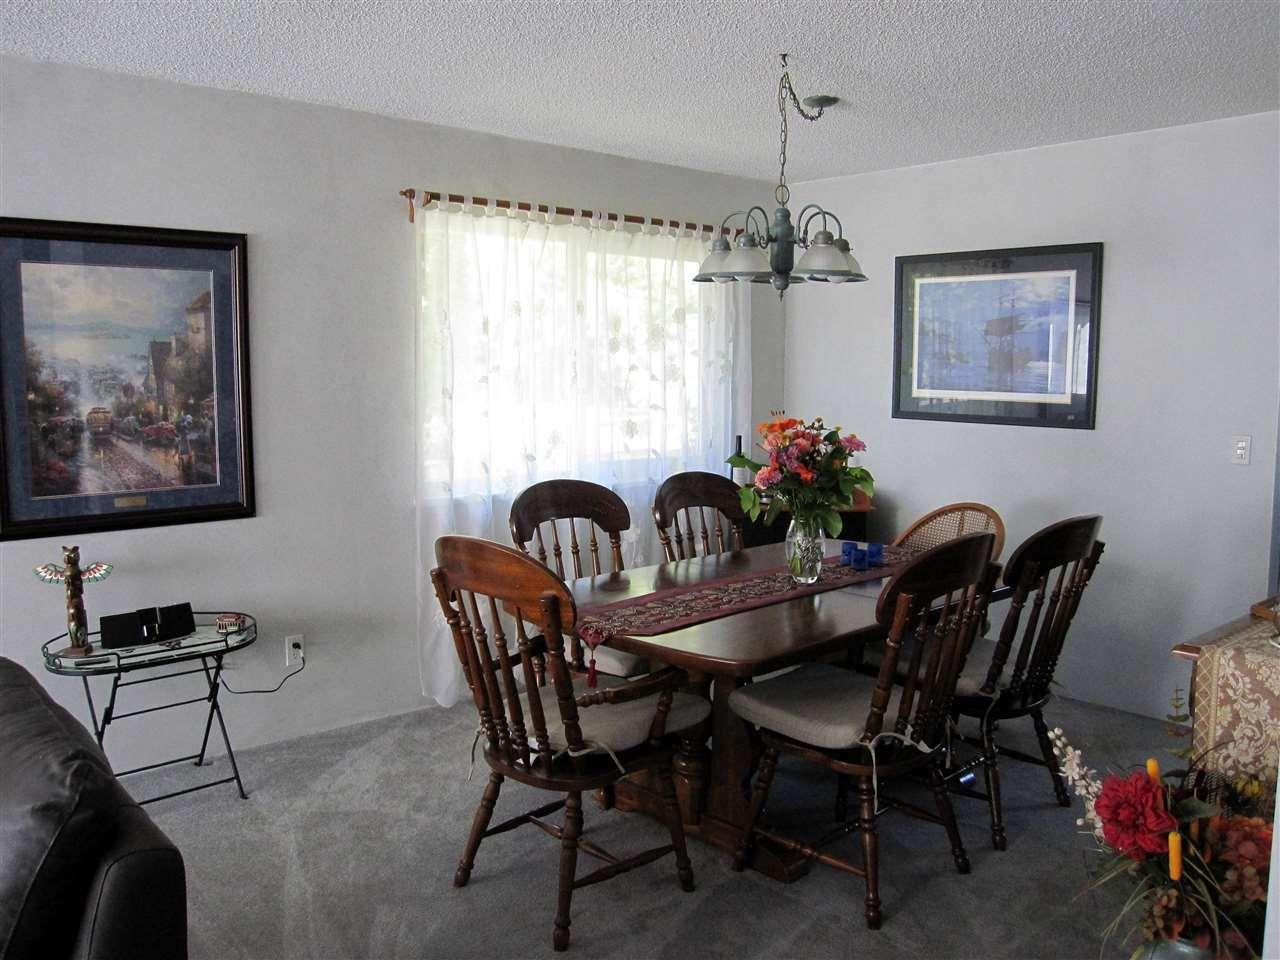 Photo 3: Photos: 21155 CUTLER Place in Maple Ridge: Southwest Maple Ridge House for sale : MLS®# R2101980